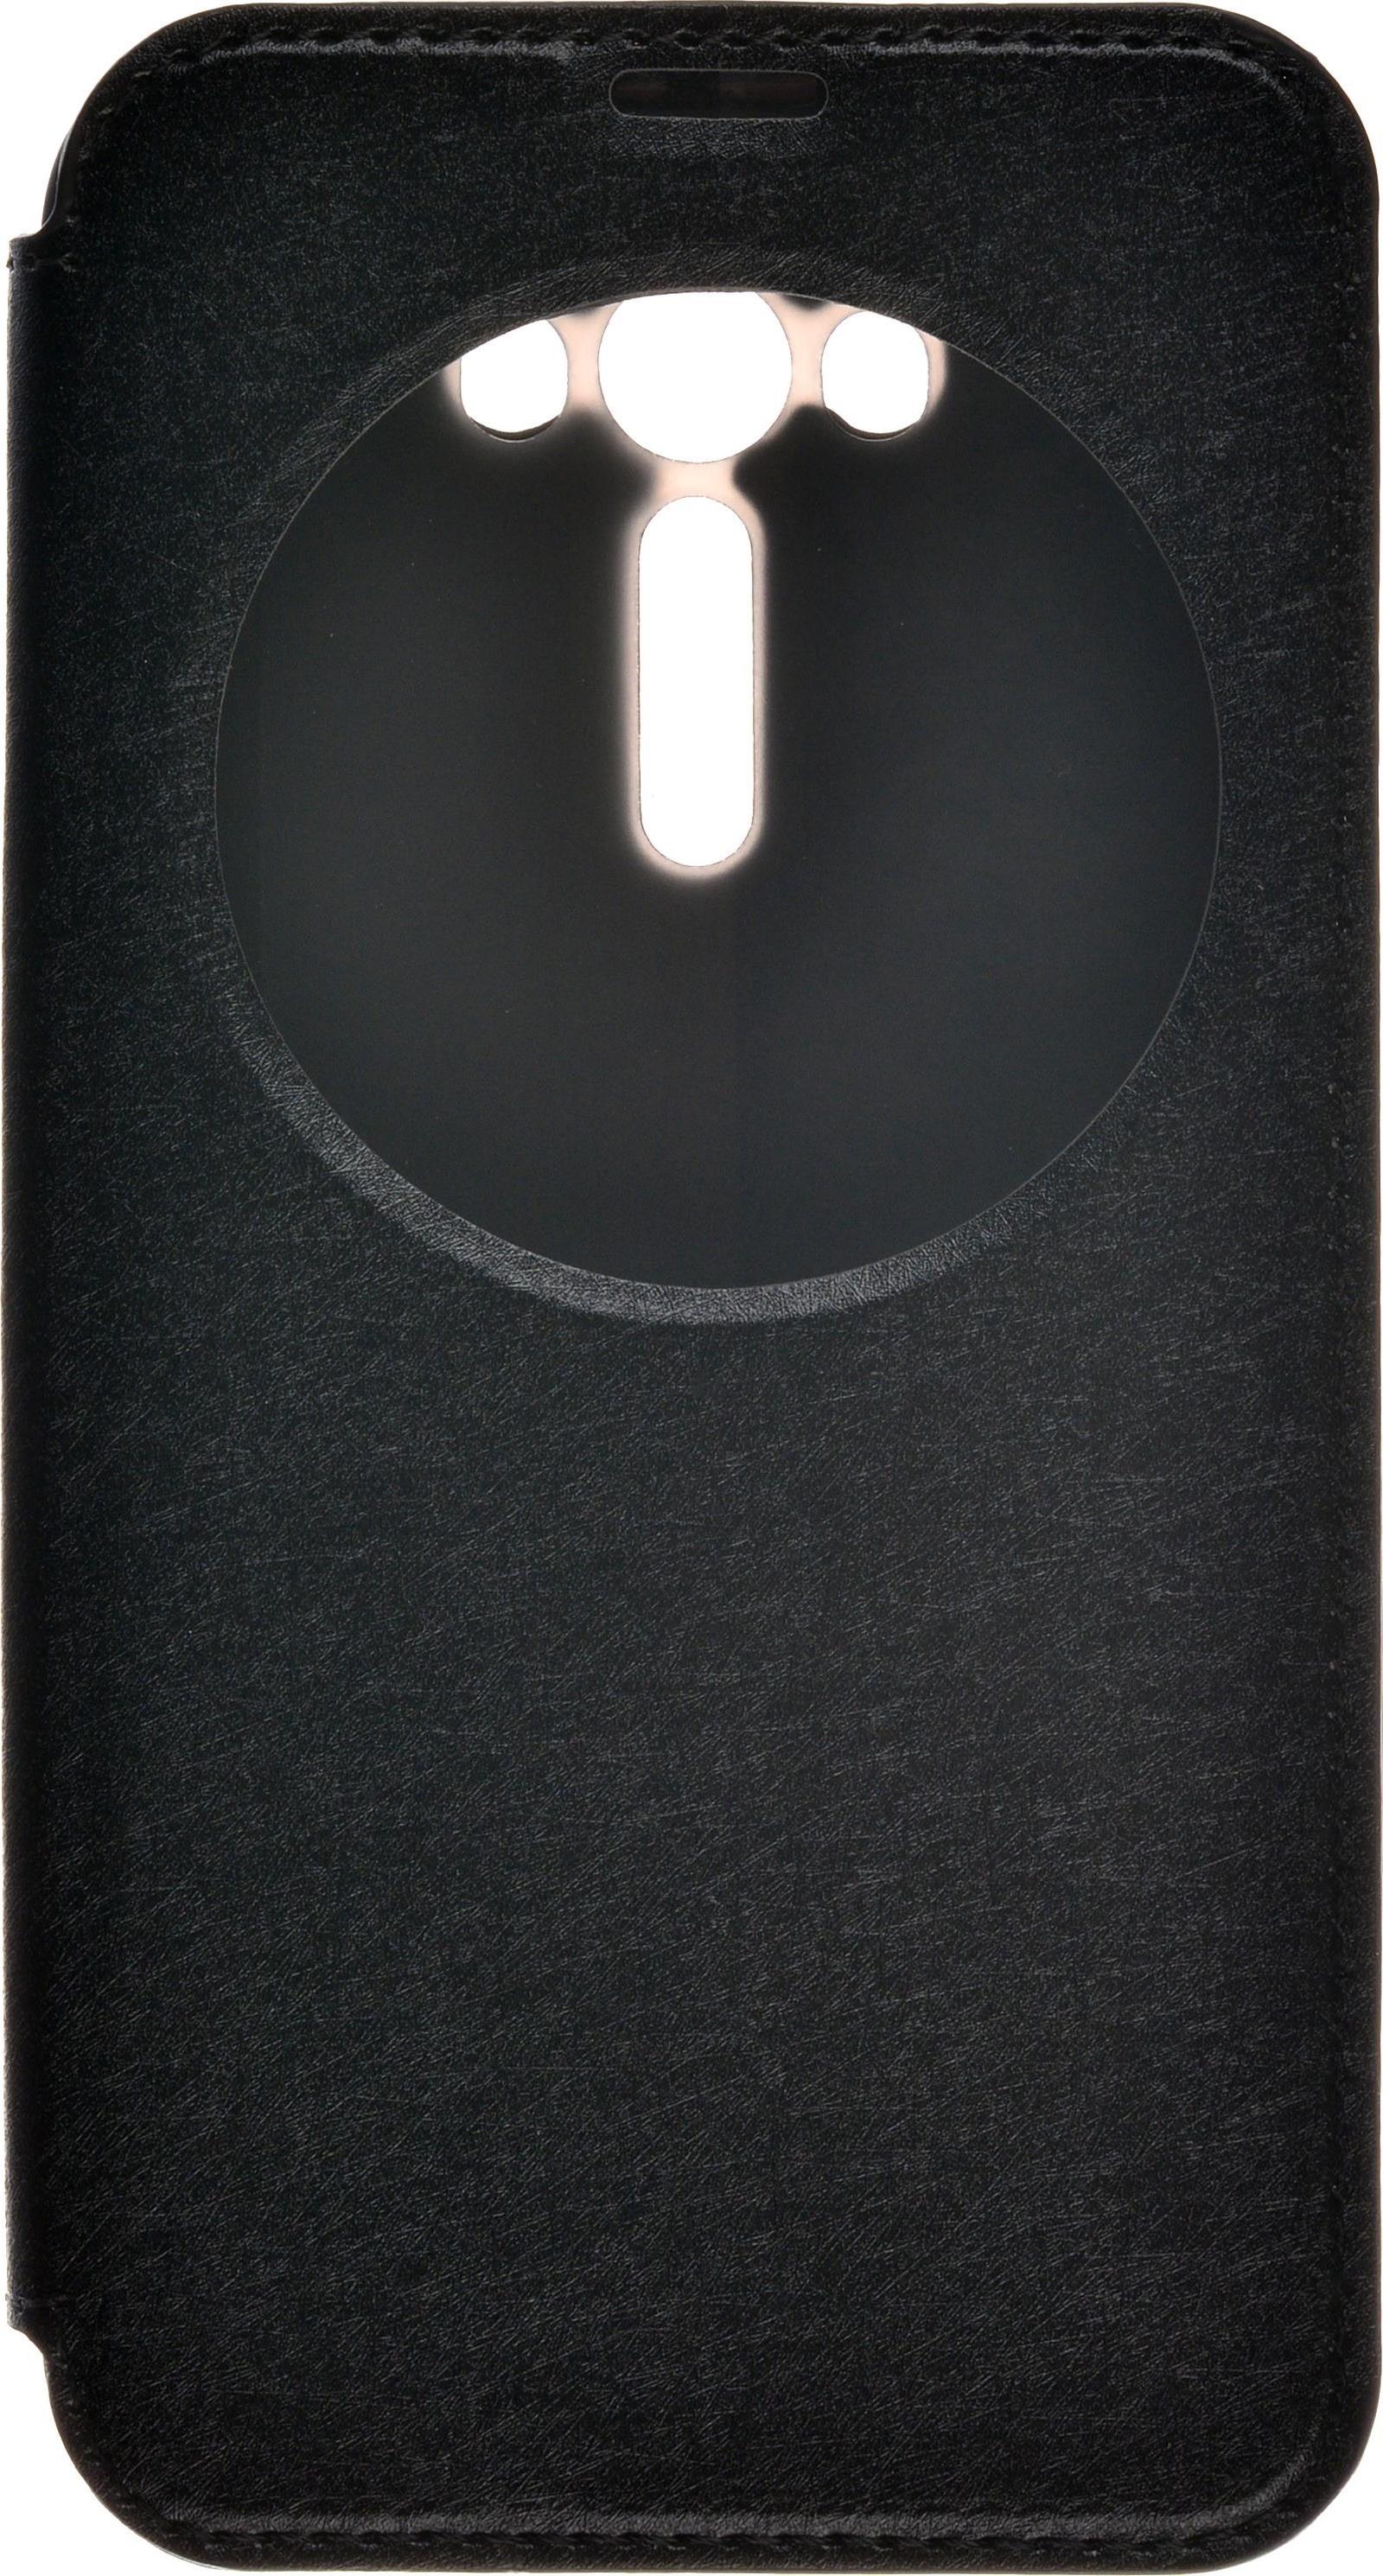 Чехол Skinbox MS AW для Asus Zenfone Laser 2 ZE550KL roar aw чехол для asus zenfone 4 a400cg white